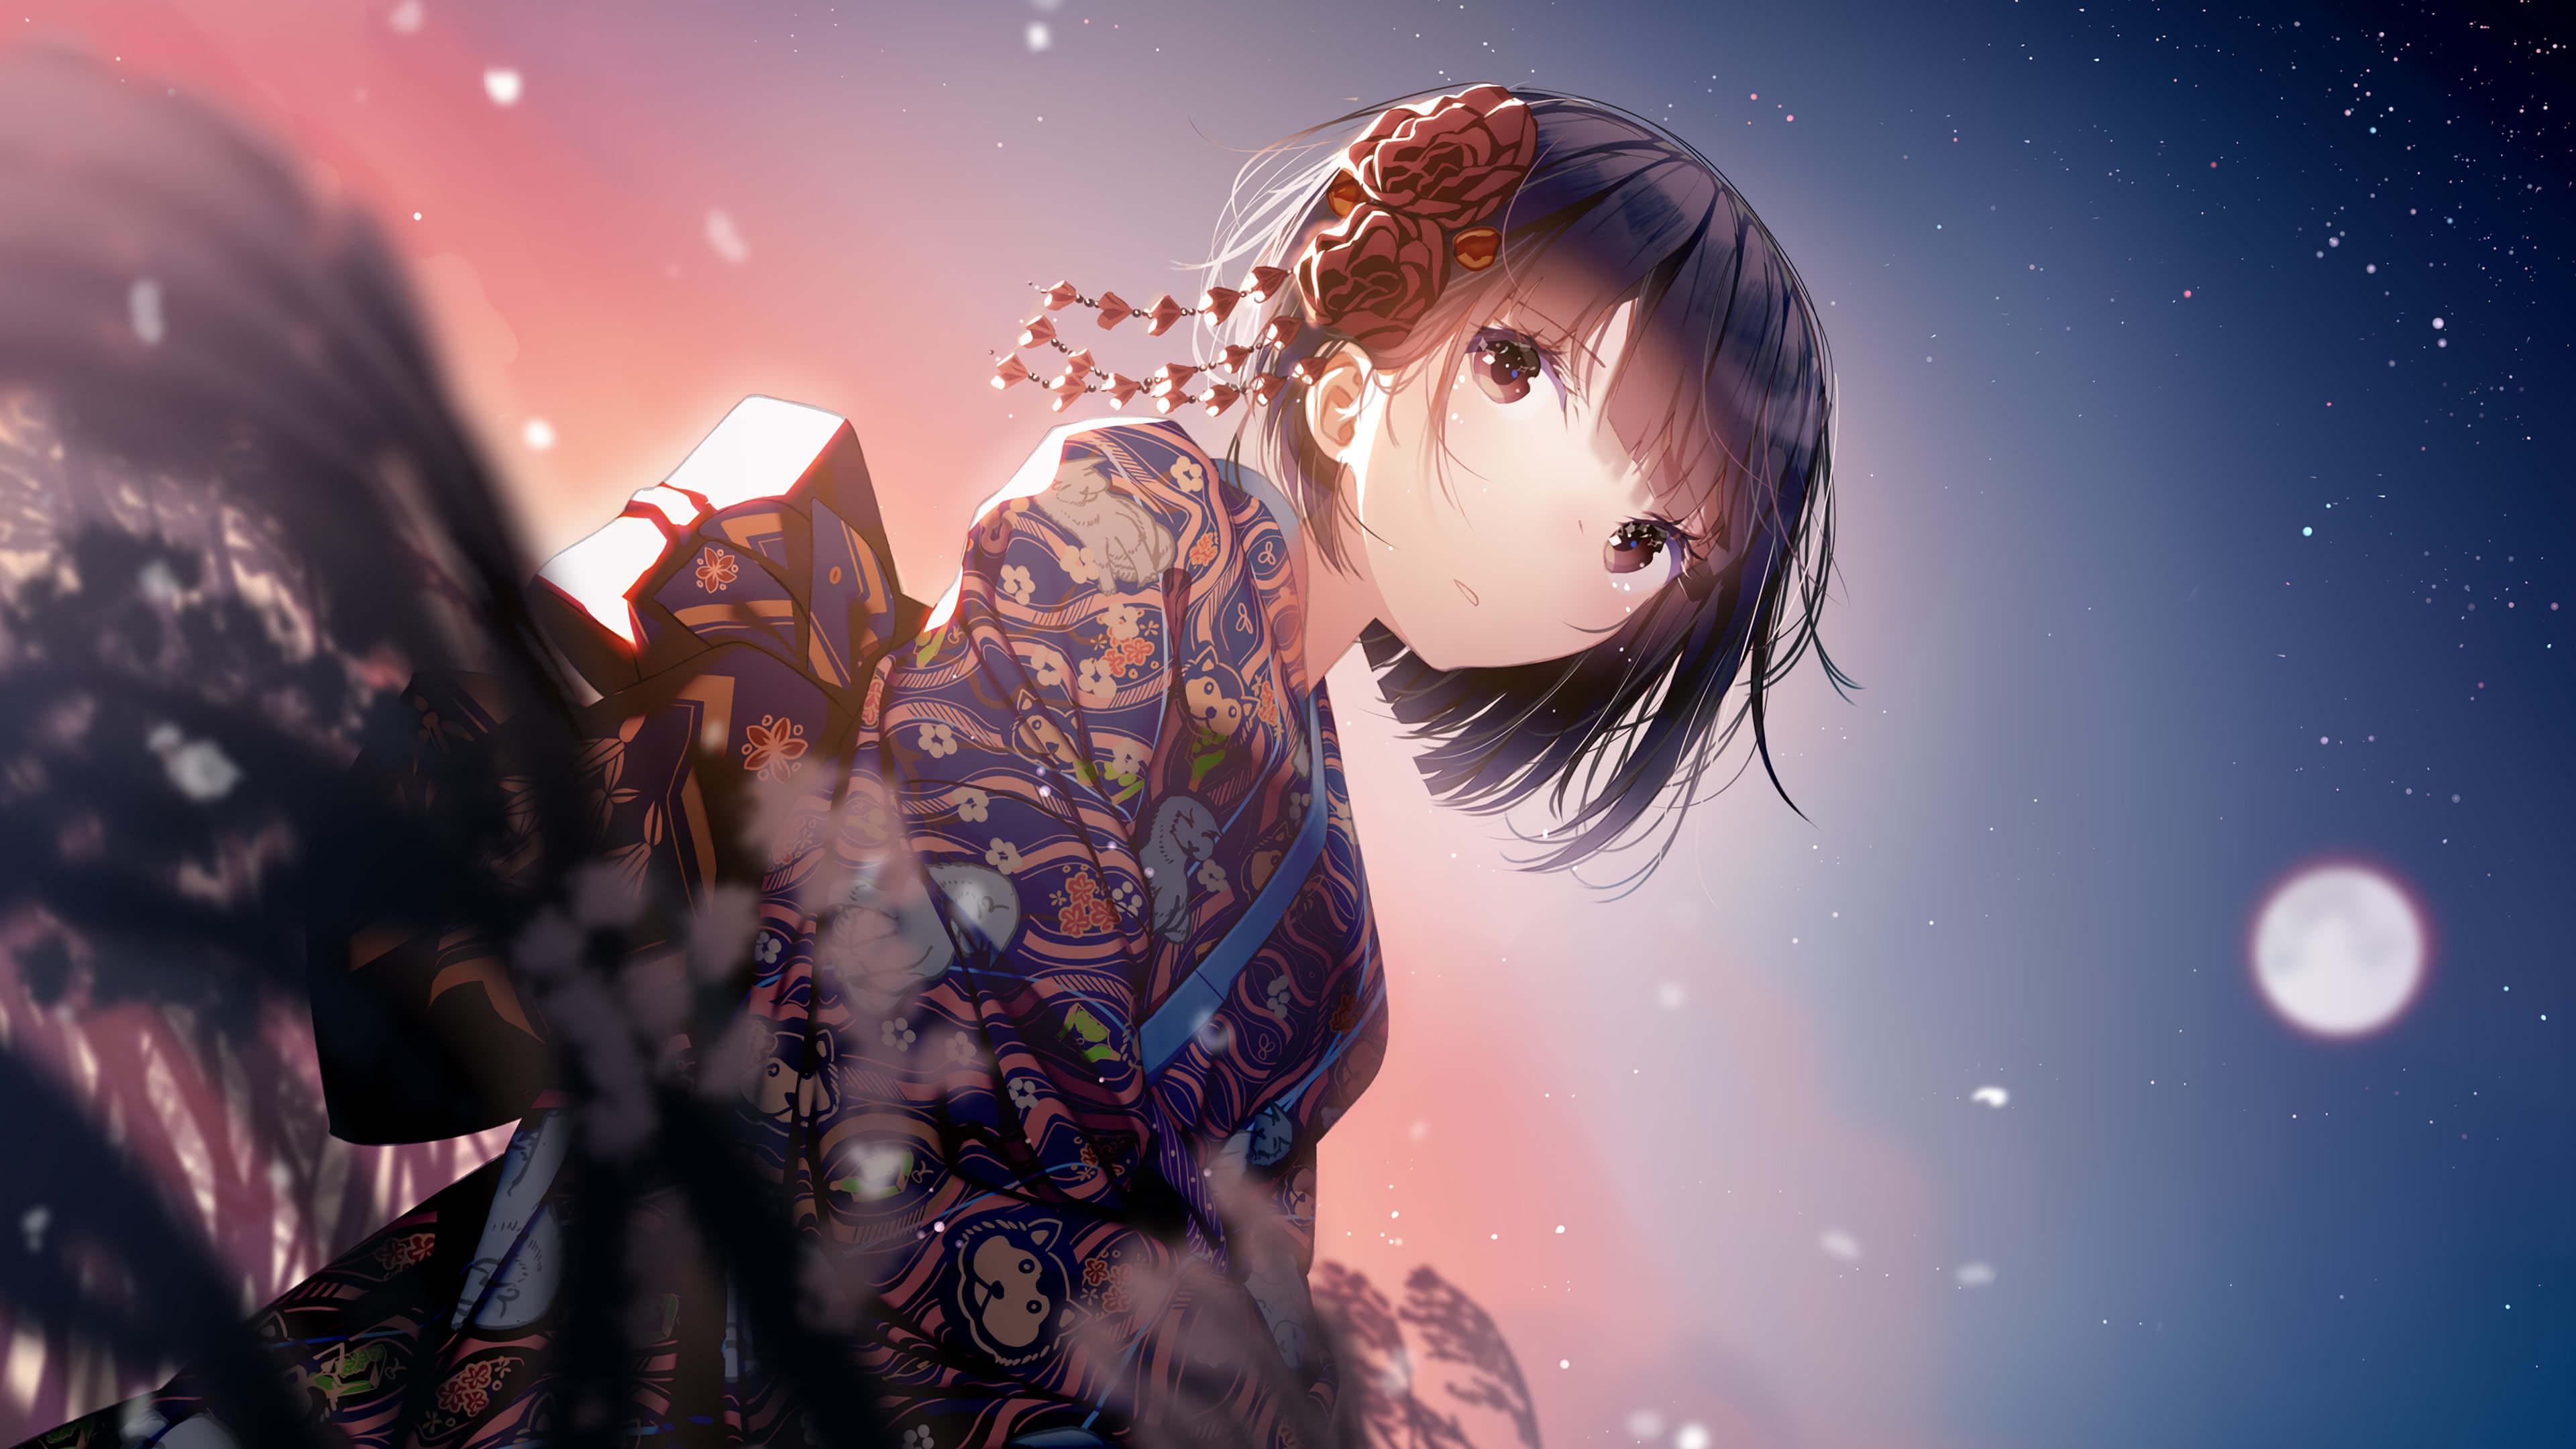 Anime 4k Wallpaper: Anime Girl Kimono UHD 4K Wallpaper